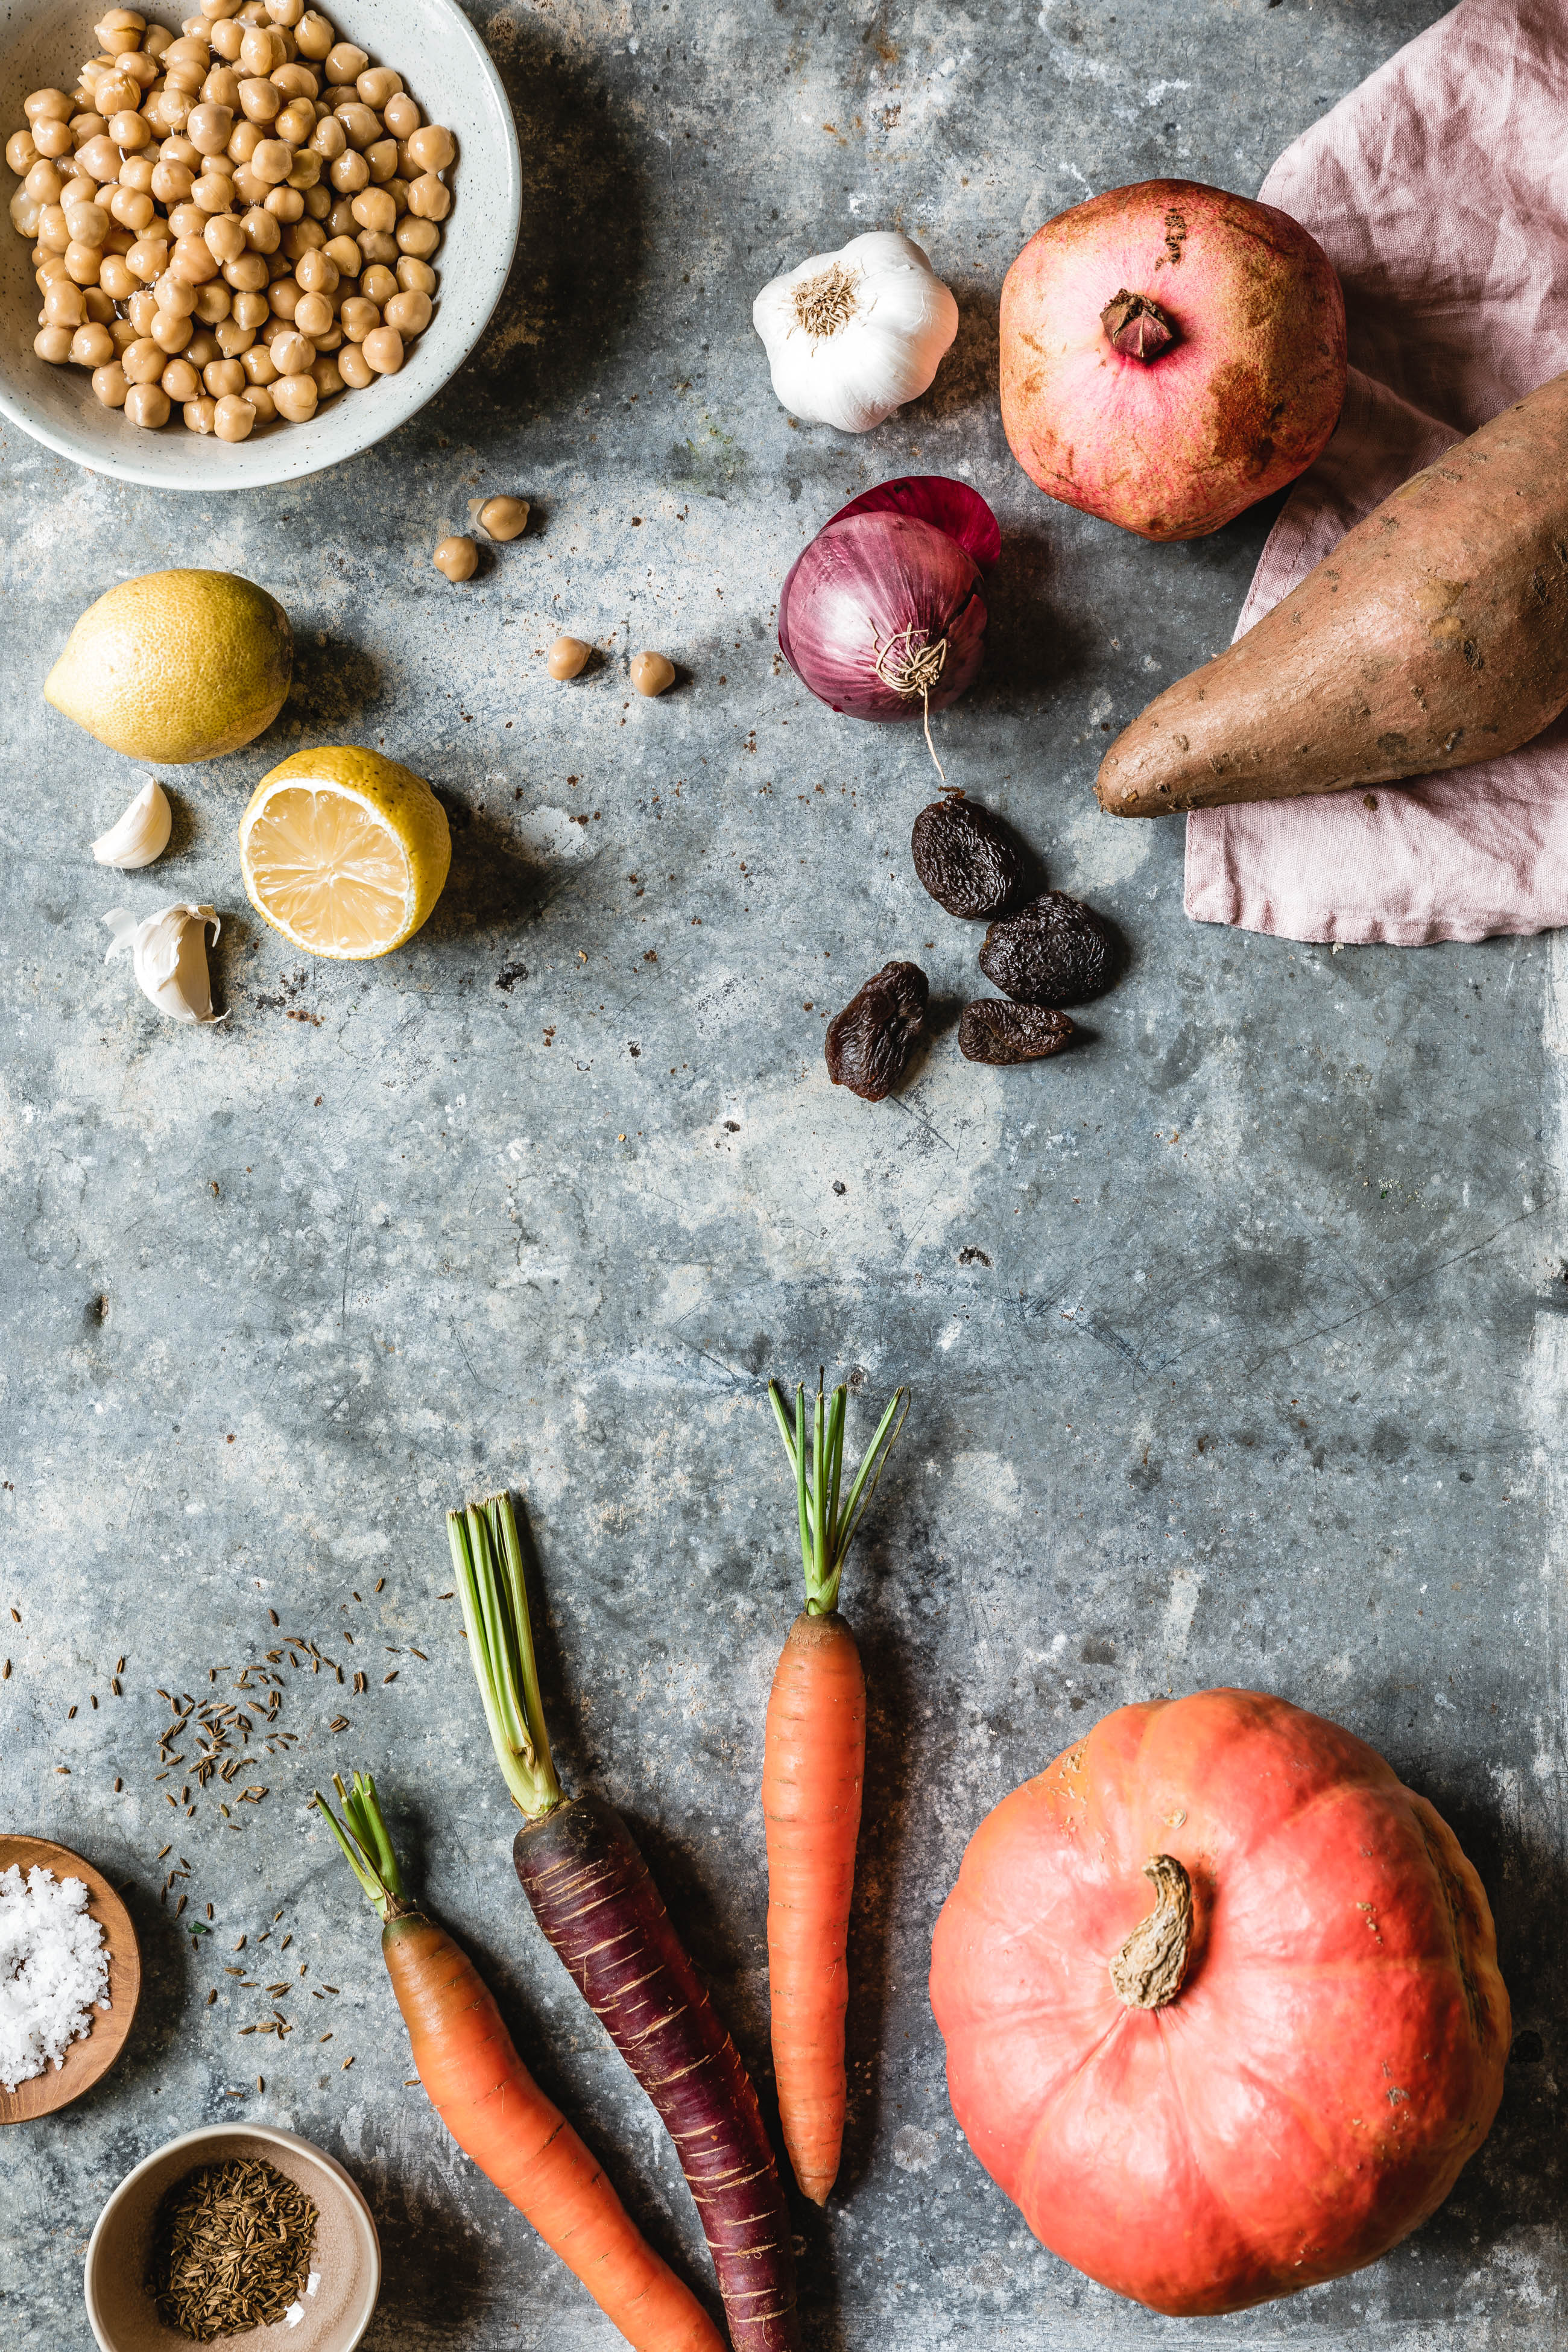 k rbis s kartoffel tajine mit couscous granatapfel eat this foodblog vegane rezepte. Black Bedroom Furniture Sets. Home Design Ideas